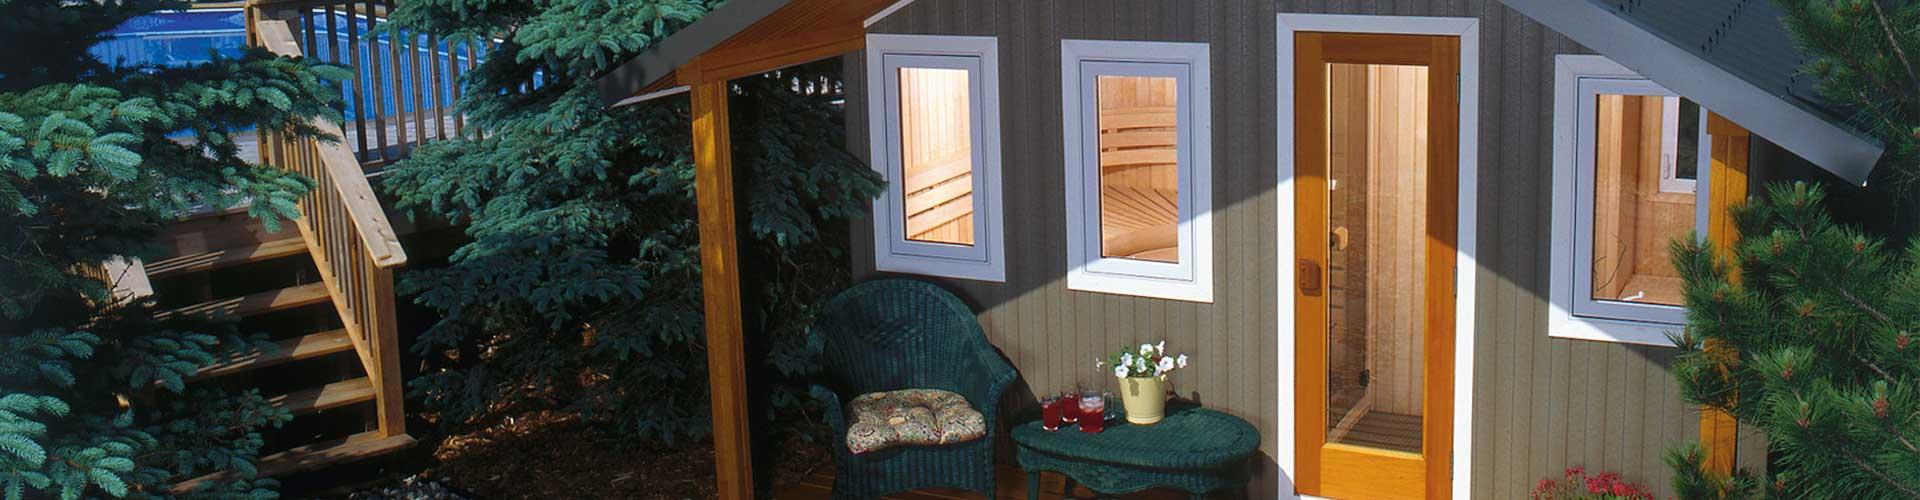 Weight Loss and the Sauna, Infrared Saunas Minneapolis